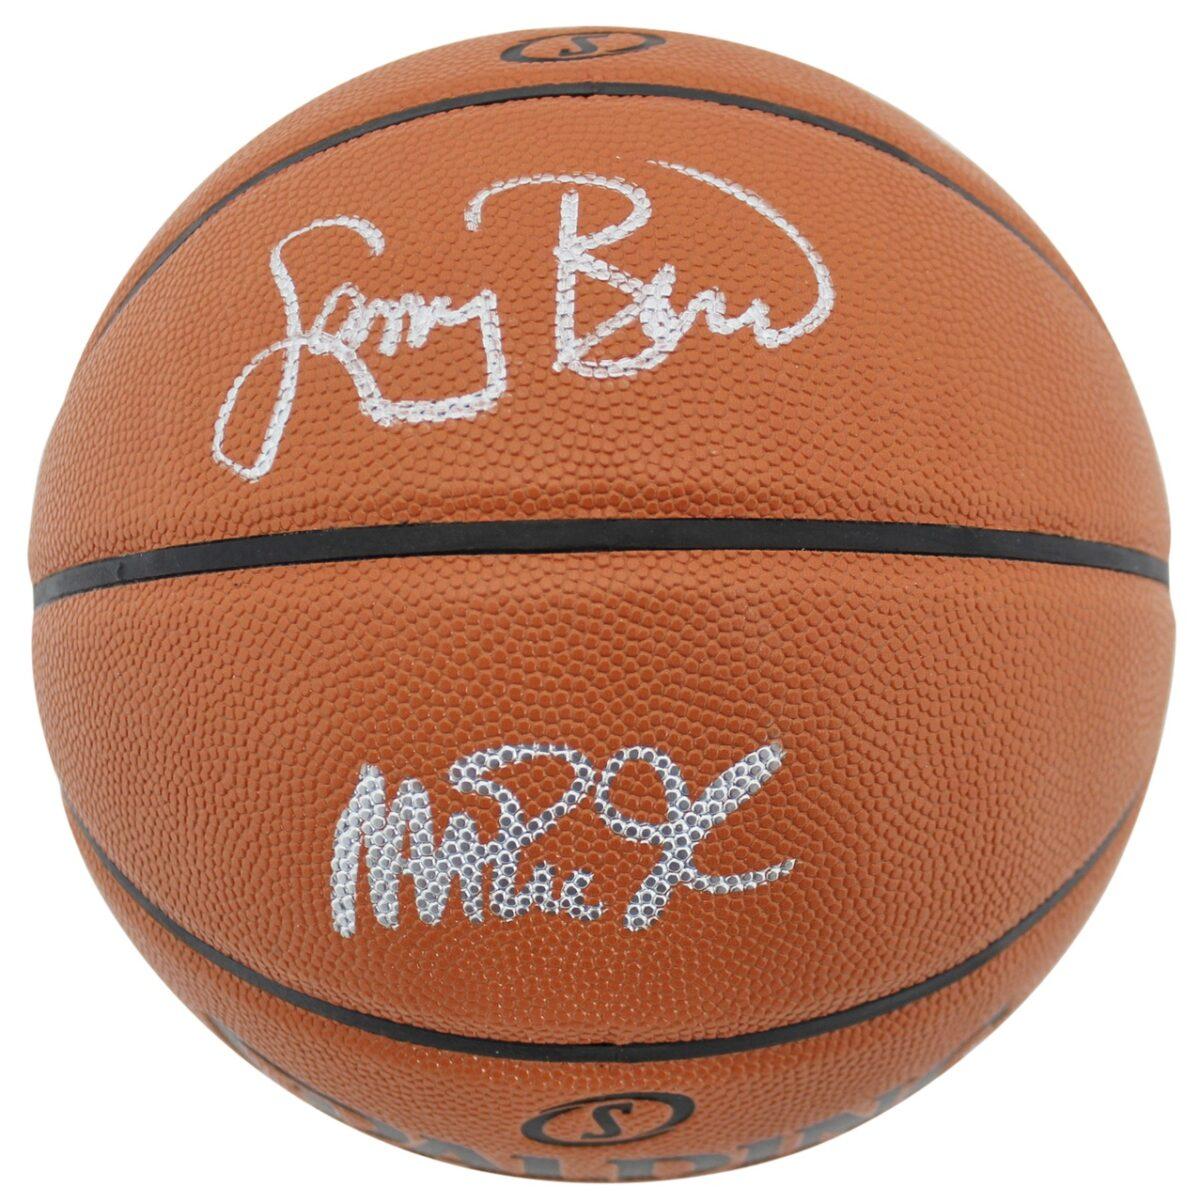 Magic Johnson & Larry Bird Authentic Signed Spalding Basketball BAS Witnessed